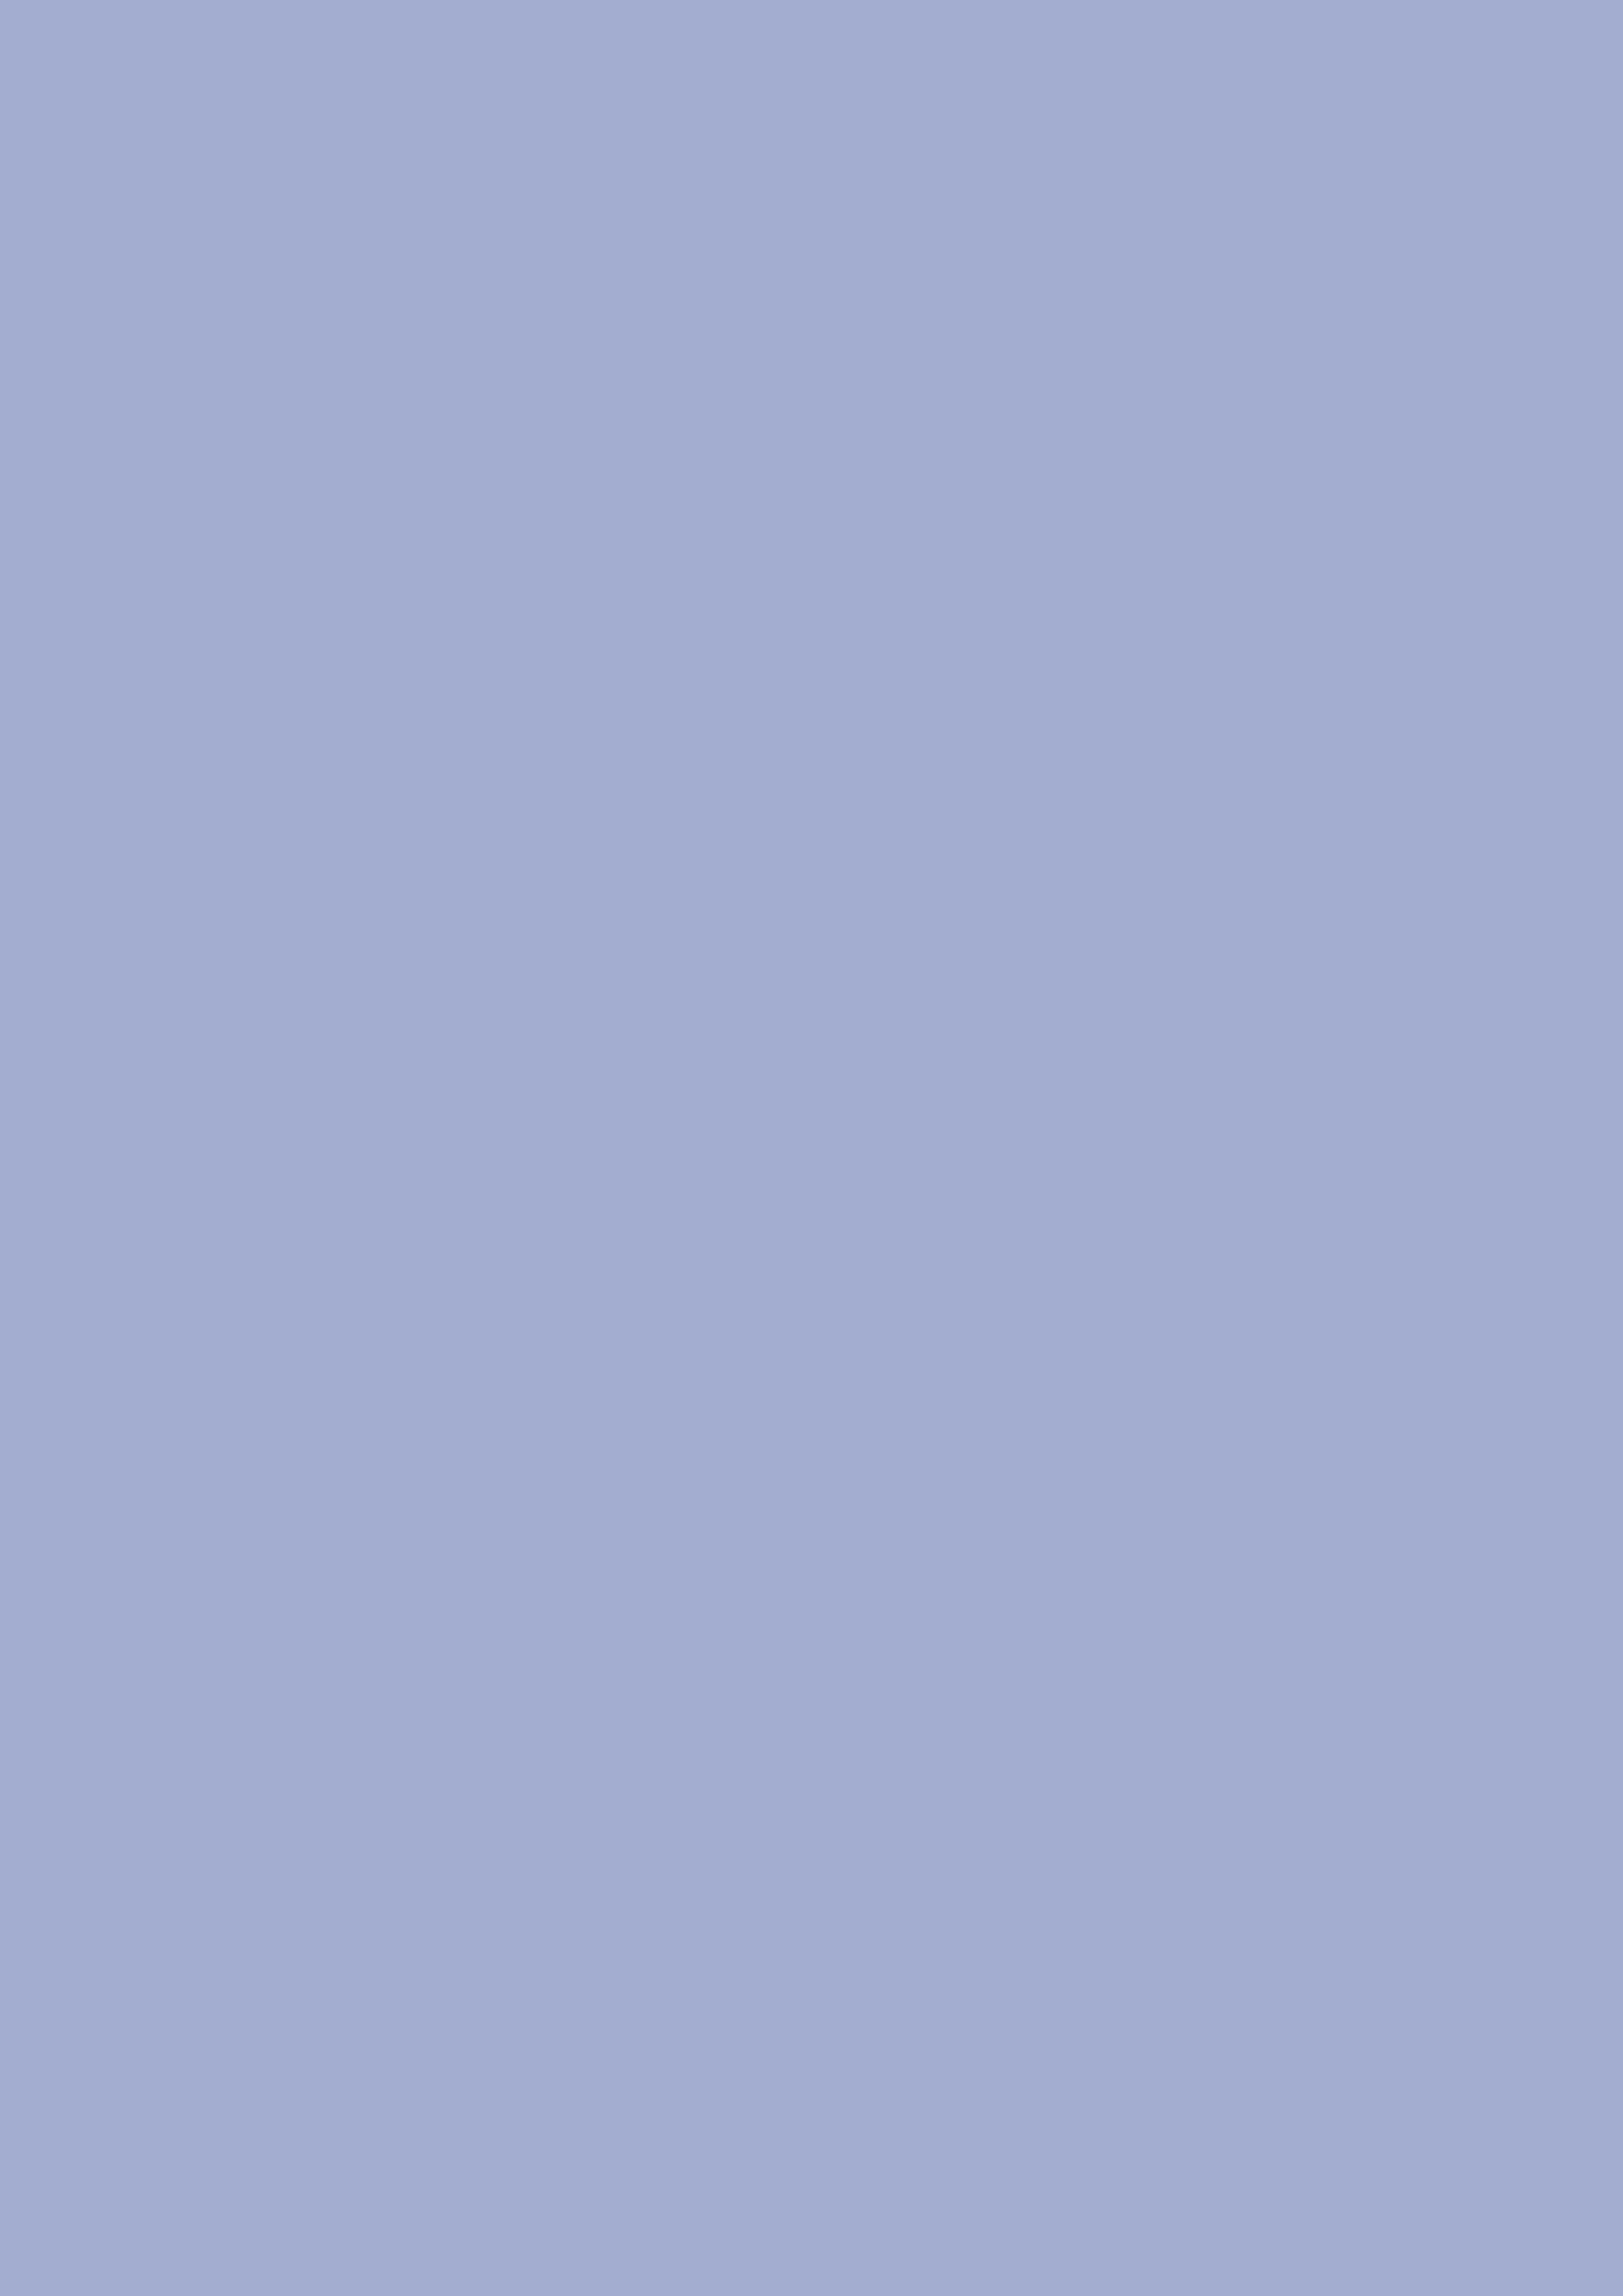 2480x3508 Wild Blue Yonder Solid Color Background